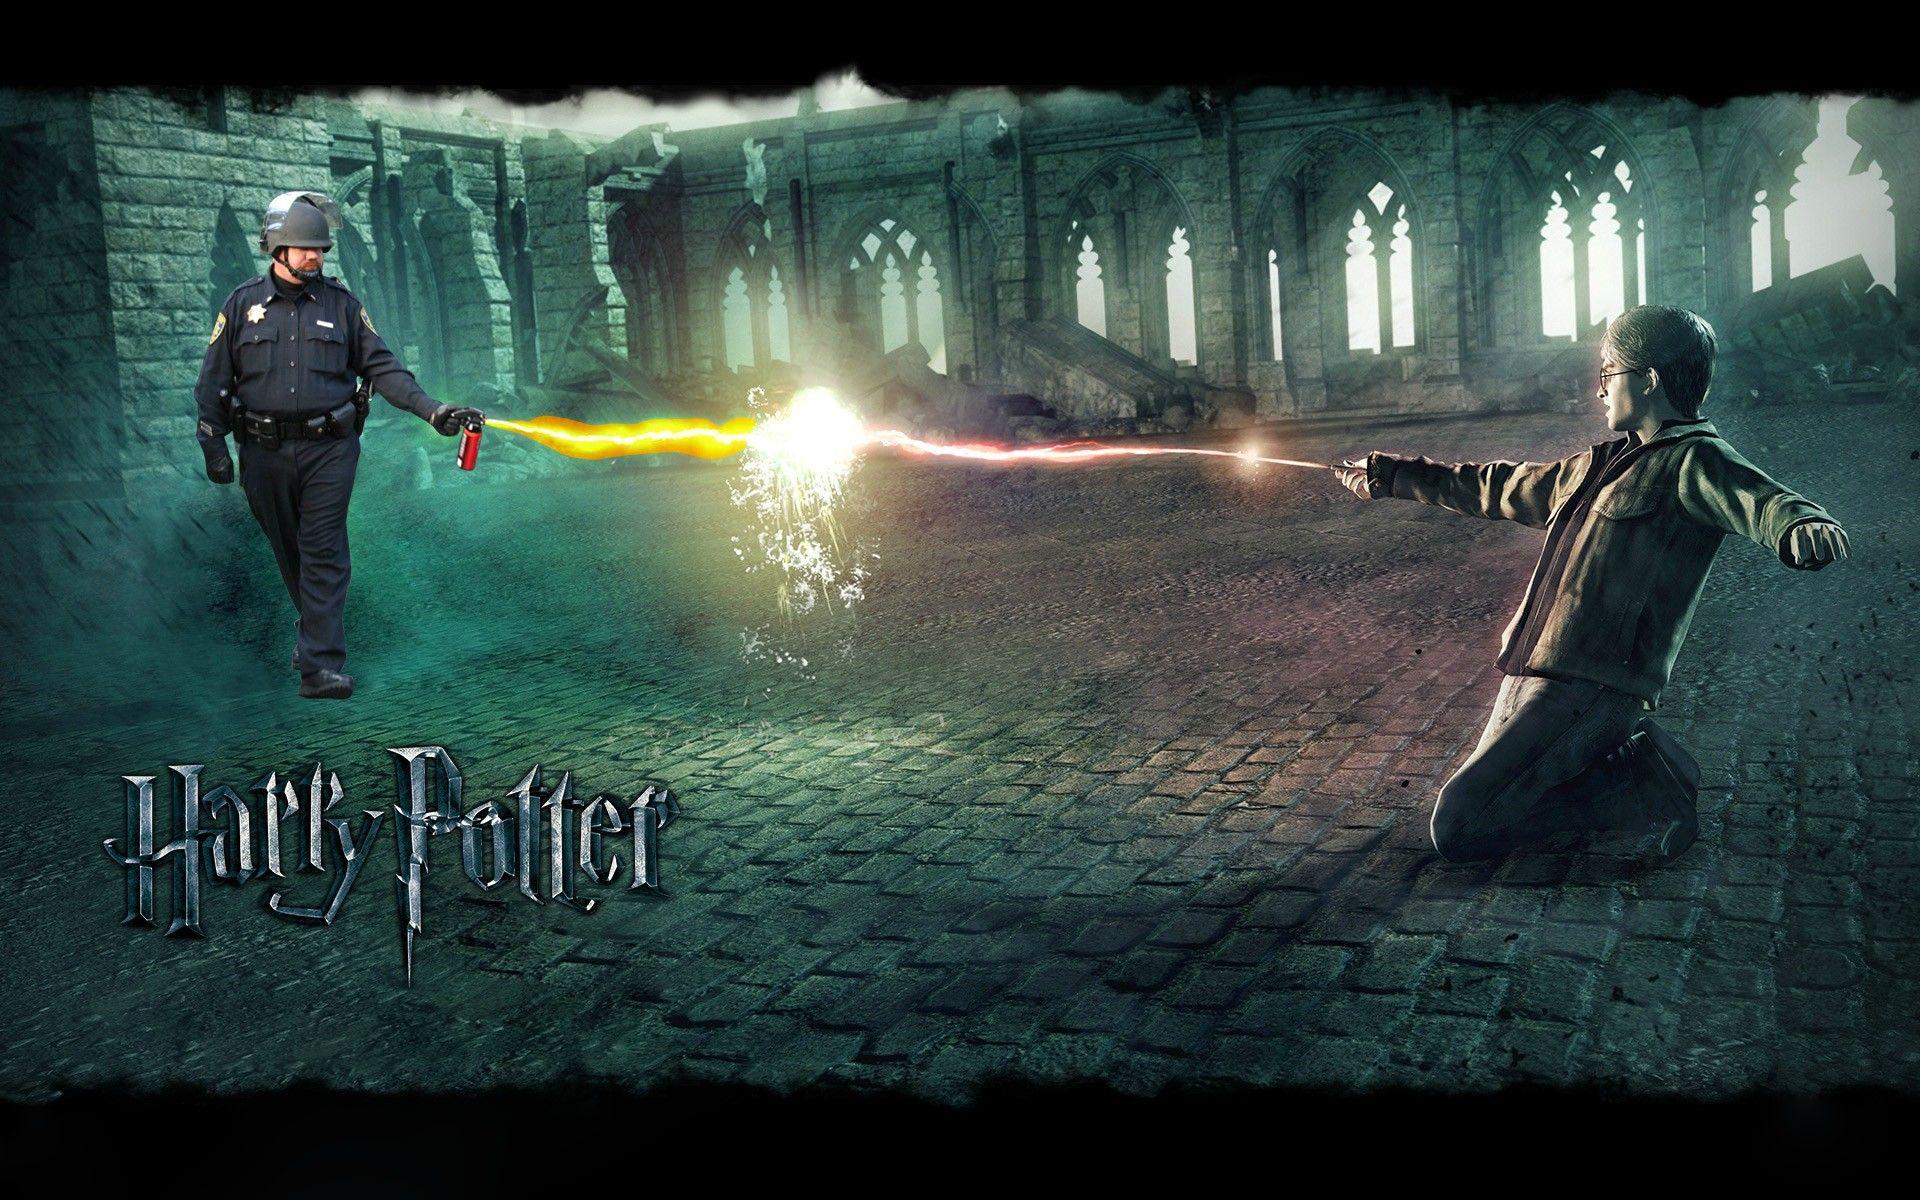 I Love Internet Memes Harry Potter Vs Voldemort Deathly Hallows Wallpaper Deathly Hallows Part 2